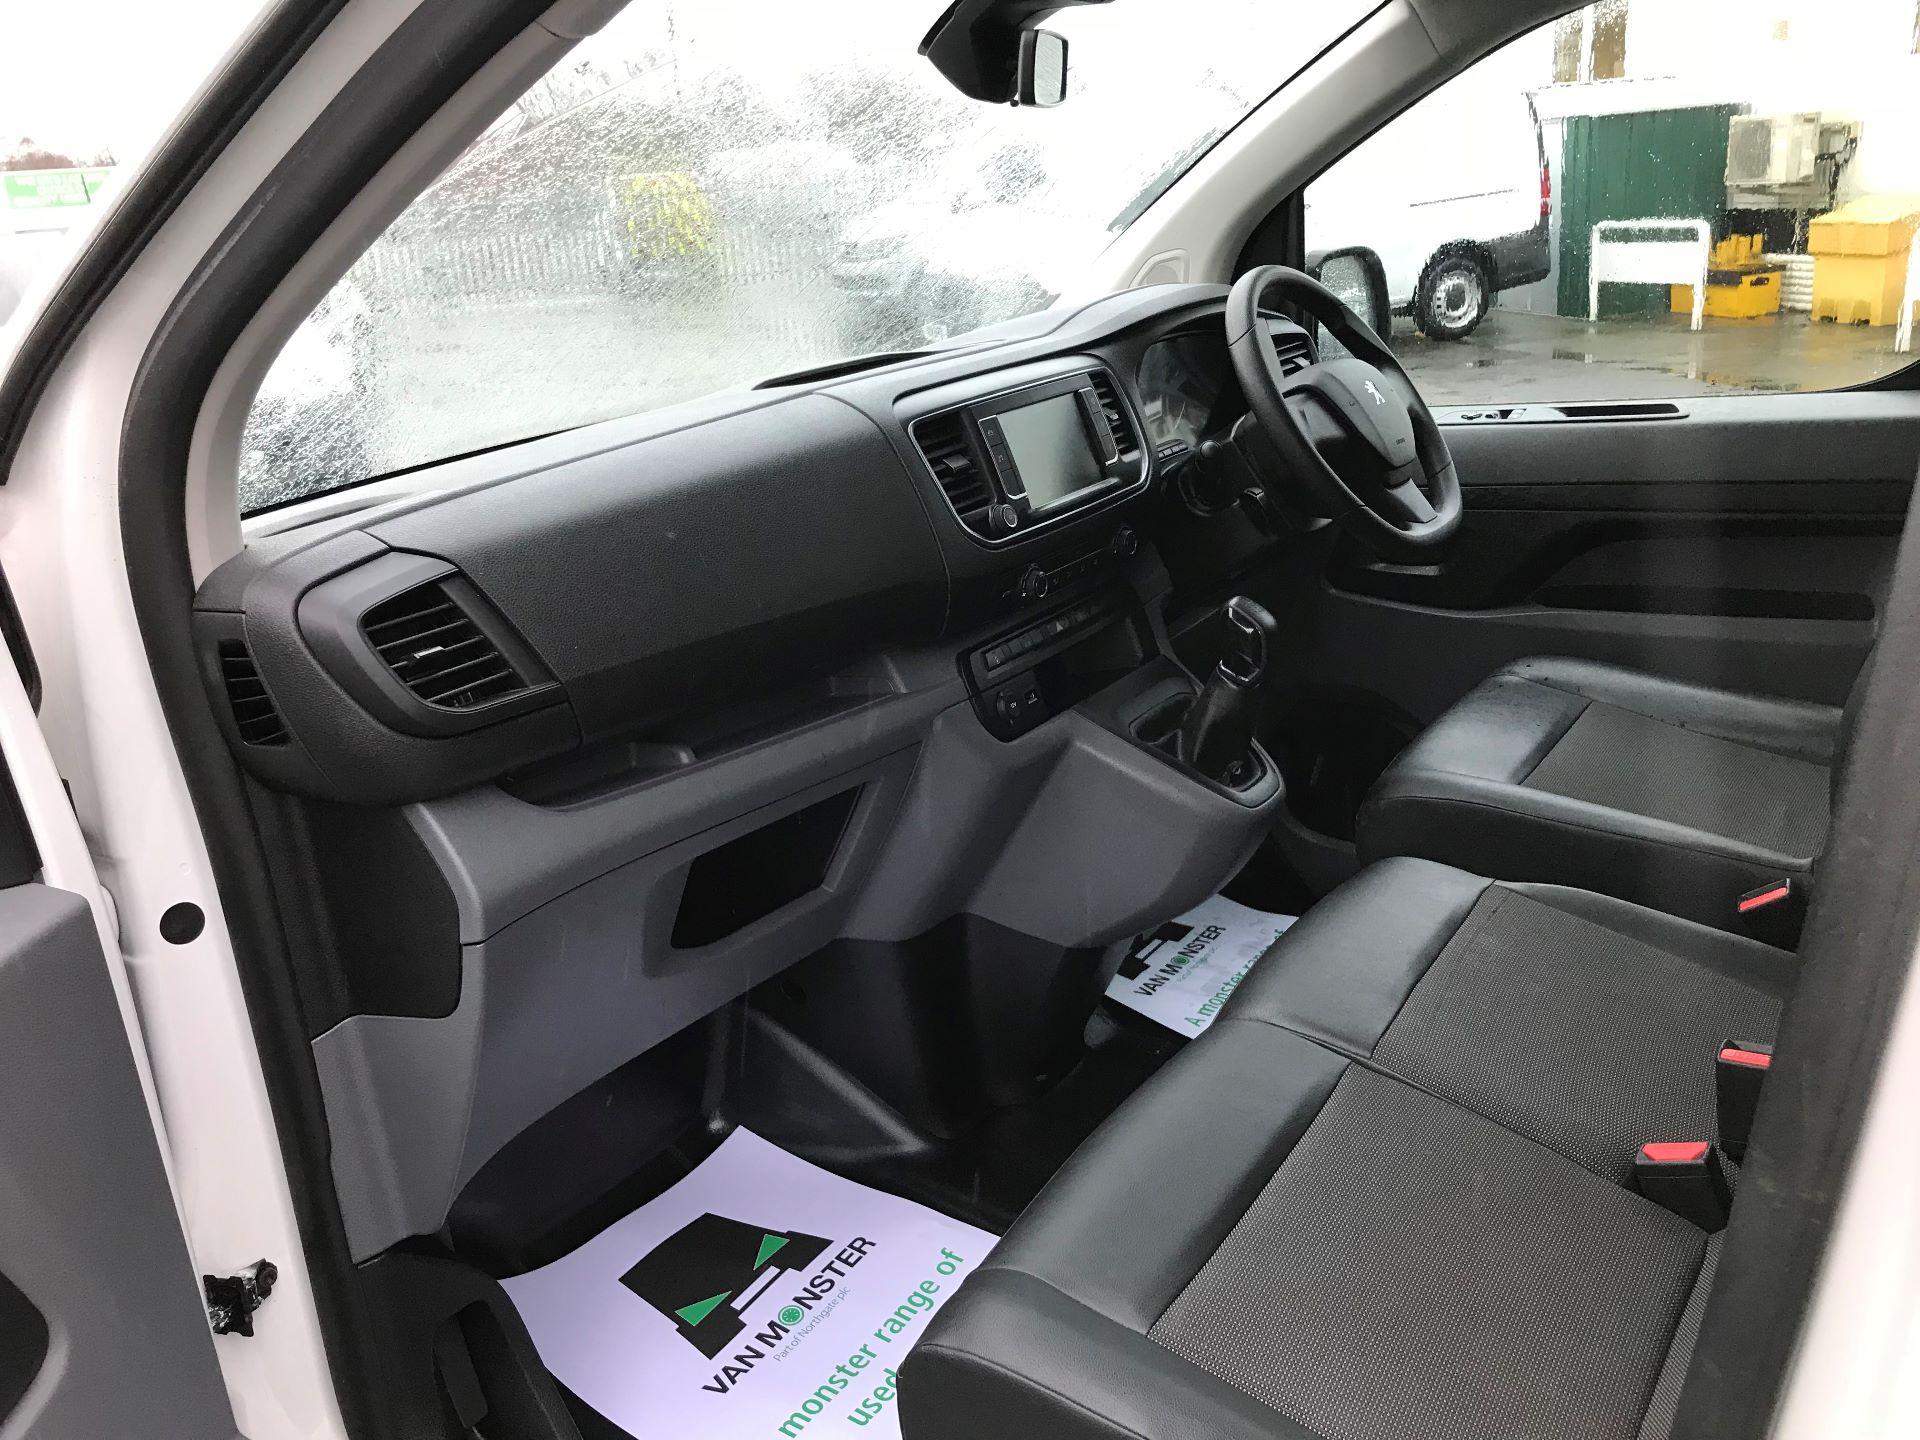 2018 Peugeot Expert STANDARD 1000 1.6 BLUEHDI 95 PROFESSIONAL EURO 6 (NU18VXF) Image 16